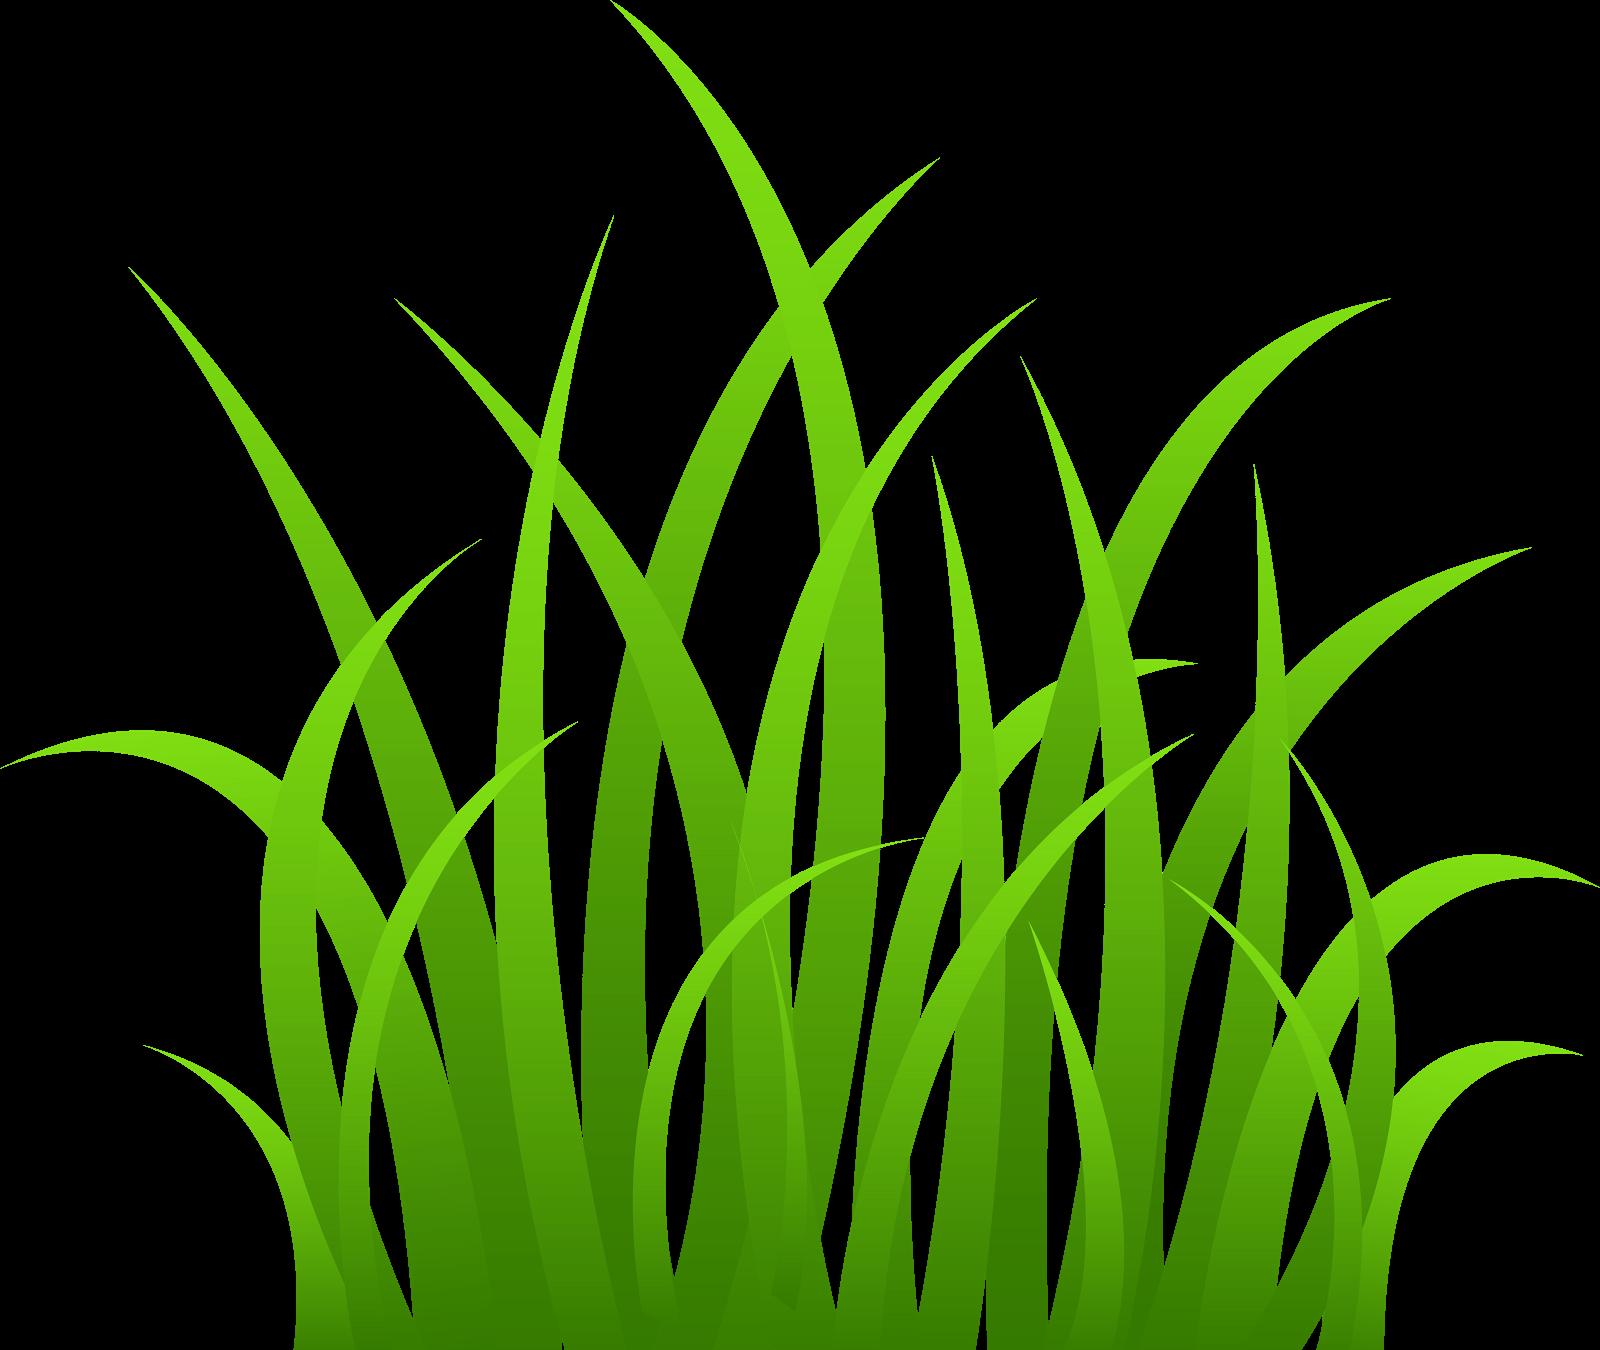 Grass plant clipart.